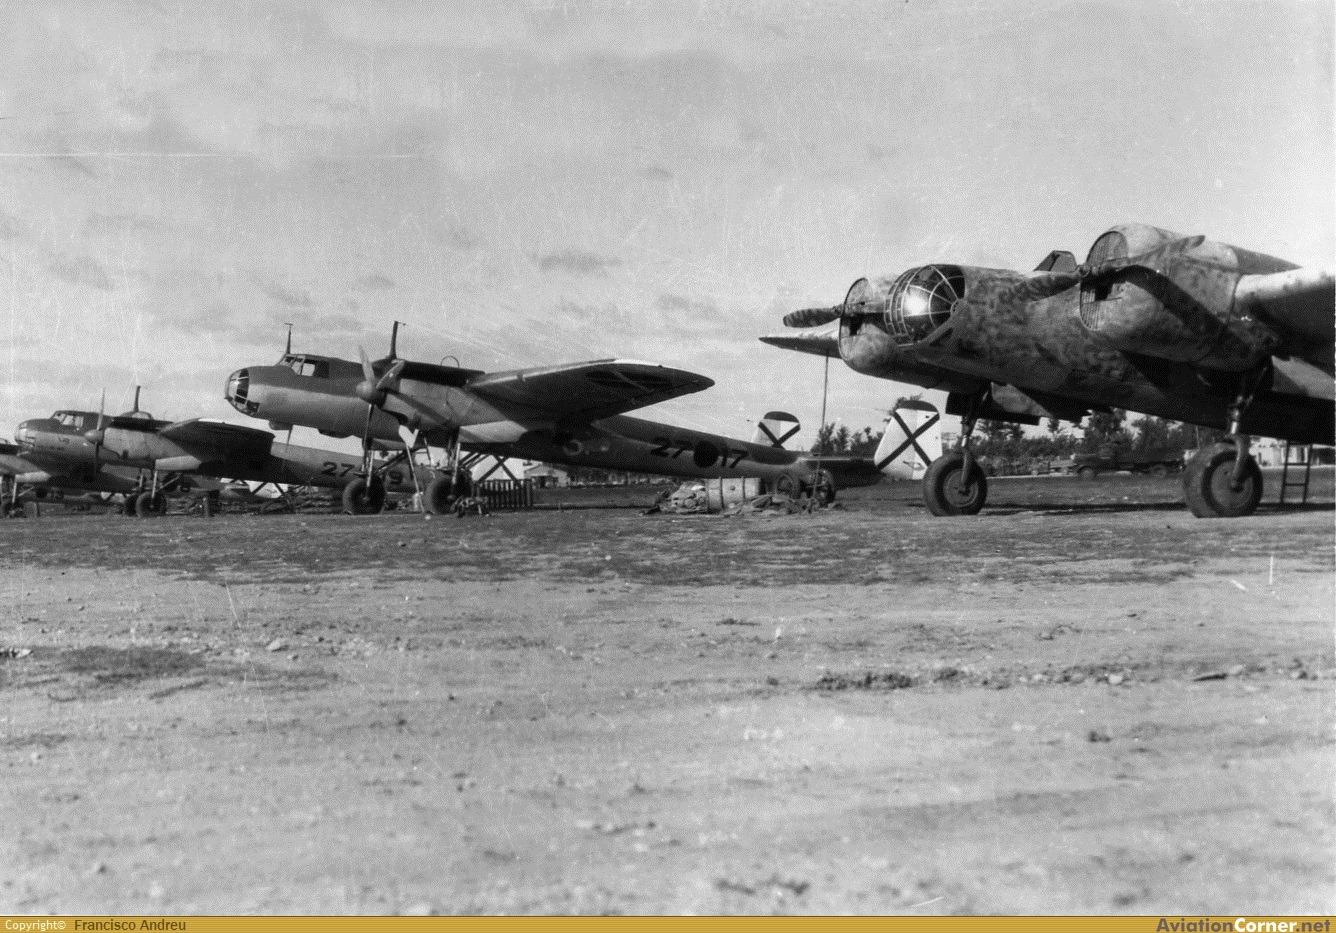 la légion condor et aviation italienne LC%2BDO-17%2B27-17%2BY%2BSB-2%2BBARAJAS%2B05-1939